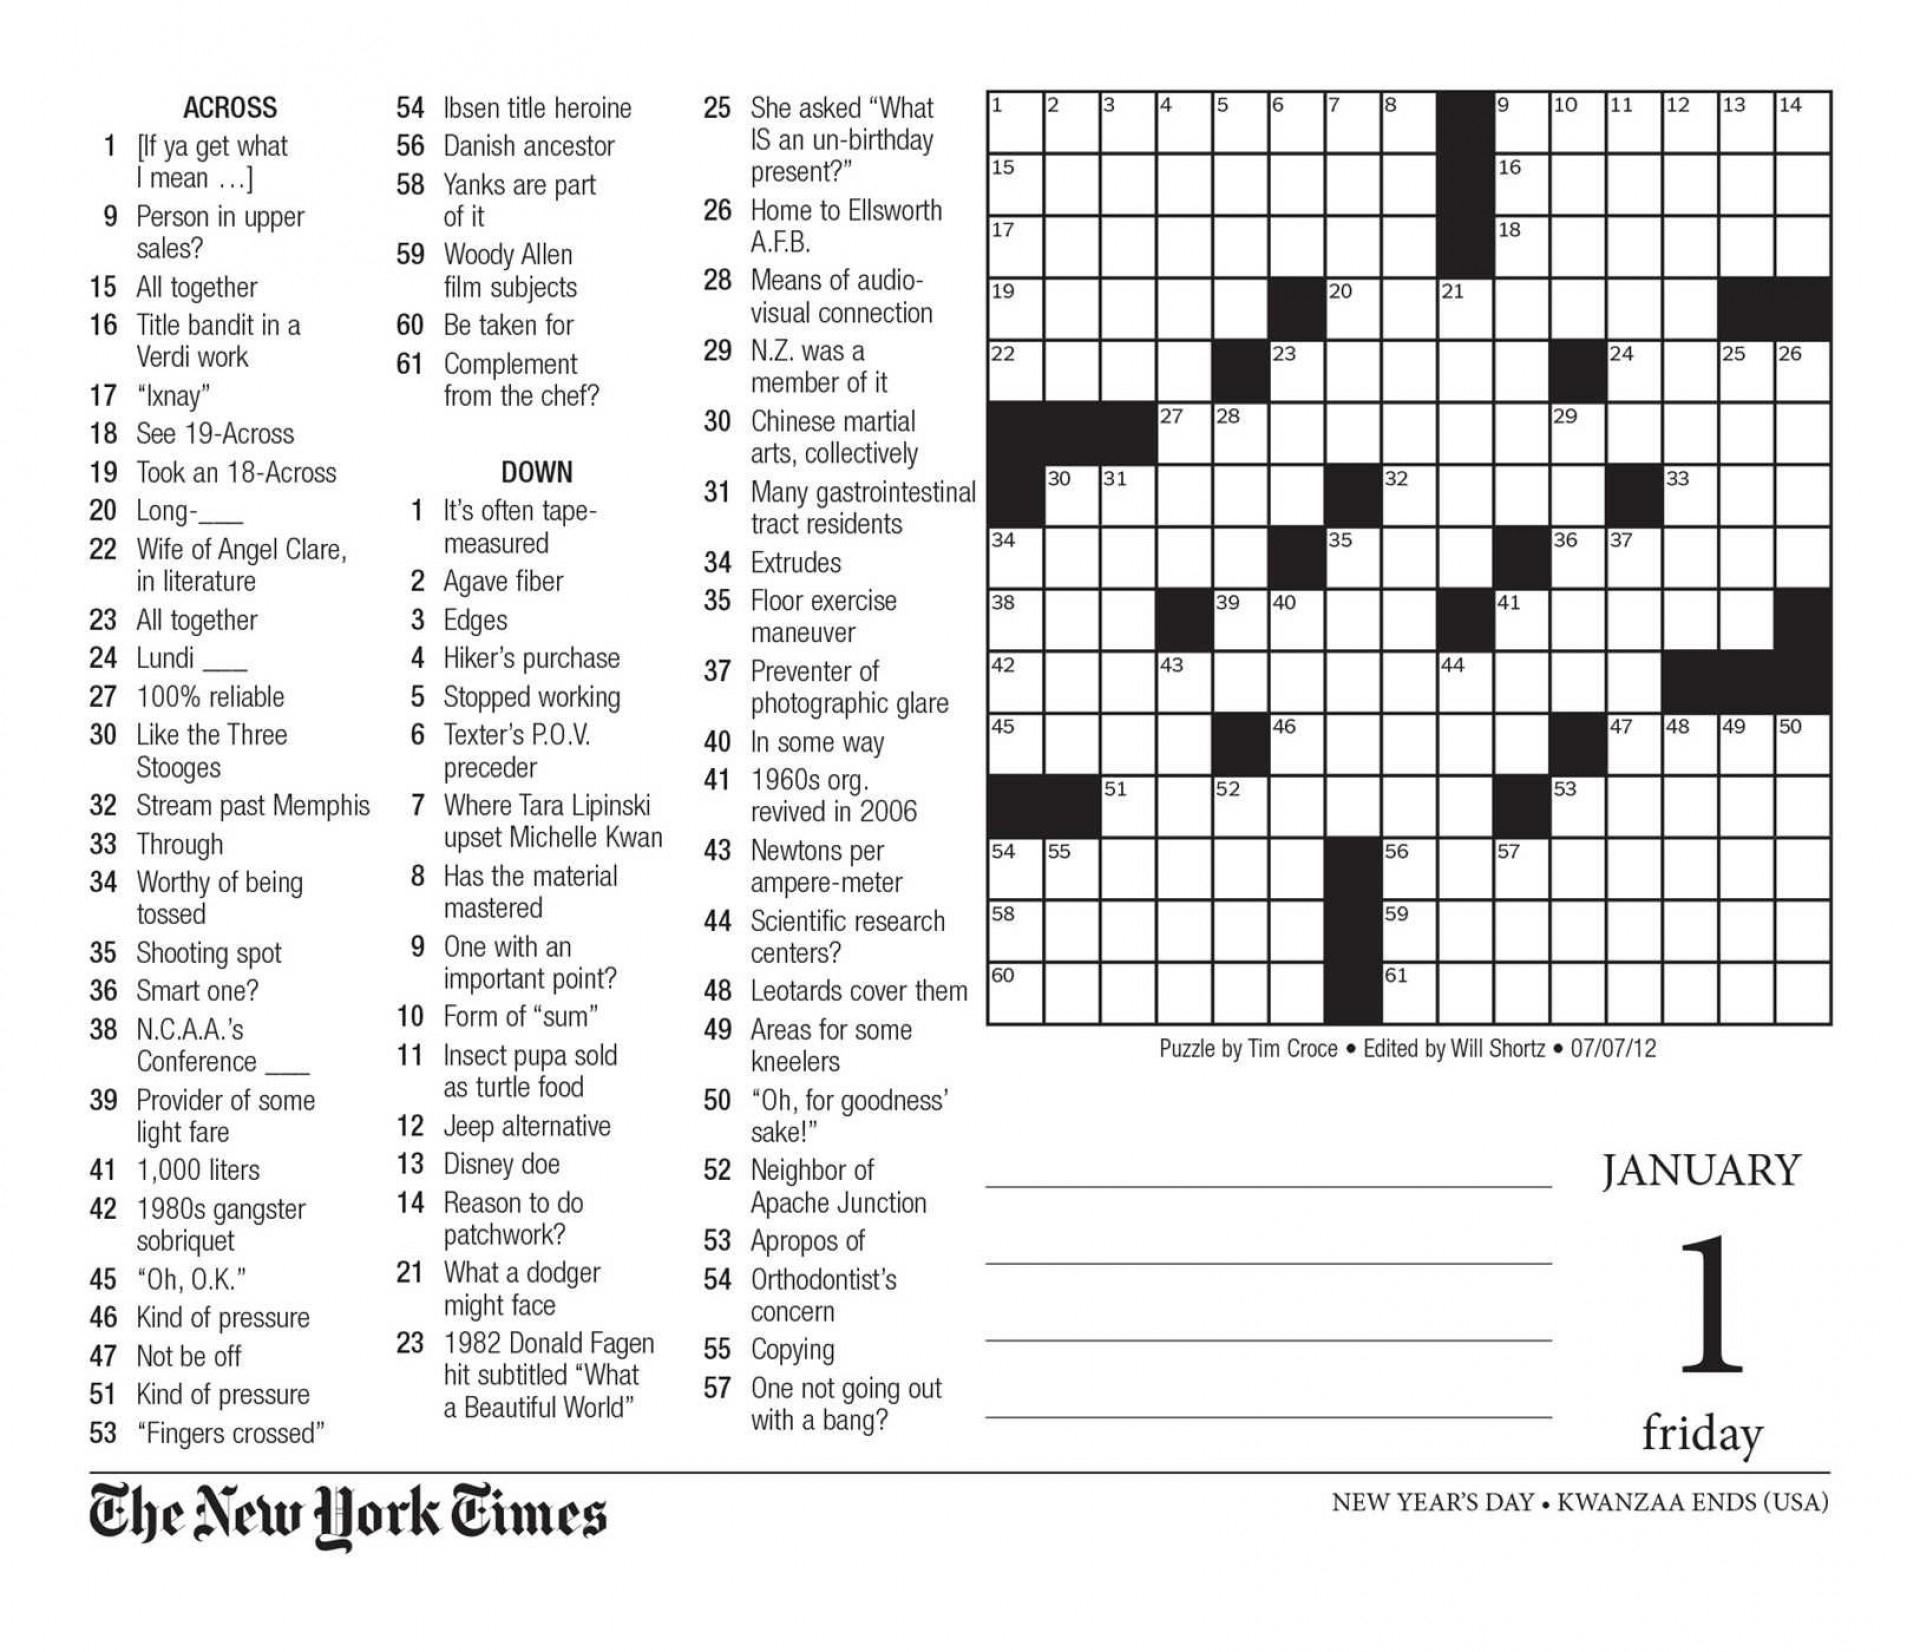 Free Printable Large Print Crossword Puzzles | M3U8 - Printable Crossword Puzzles For Elderly